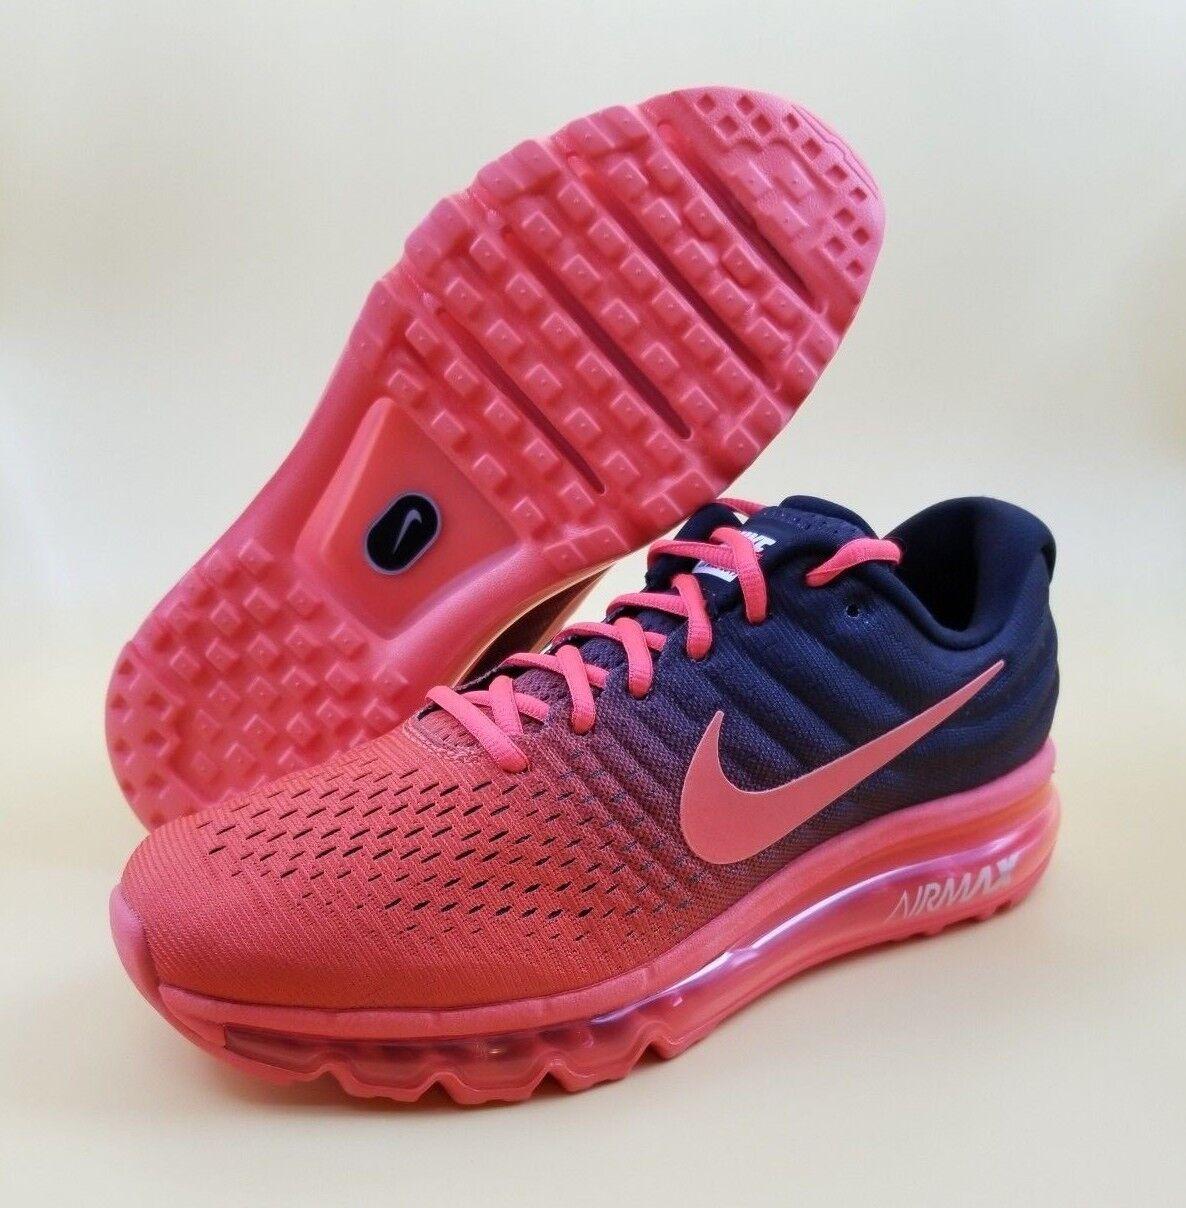 Nike Air Max 2017 SIZE 7 Men Running shoes Crimson Black MSRP  190